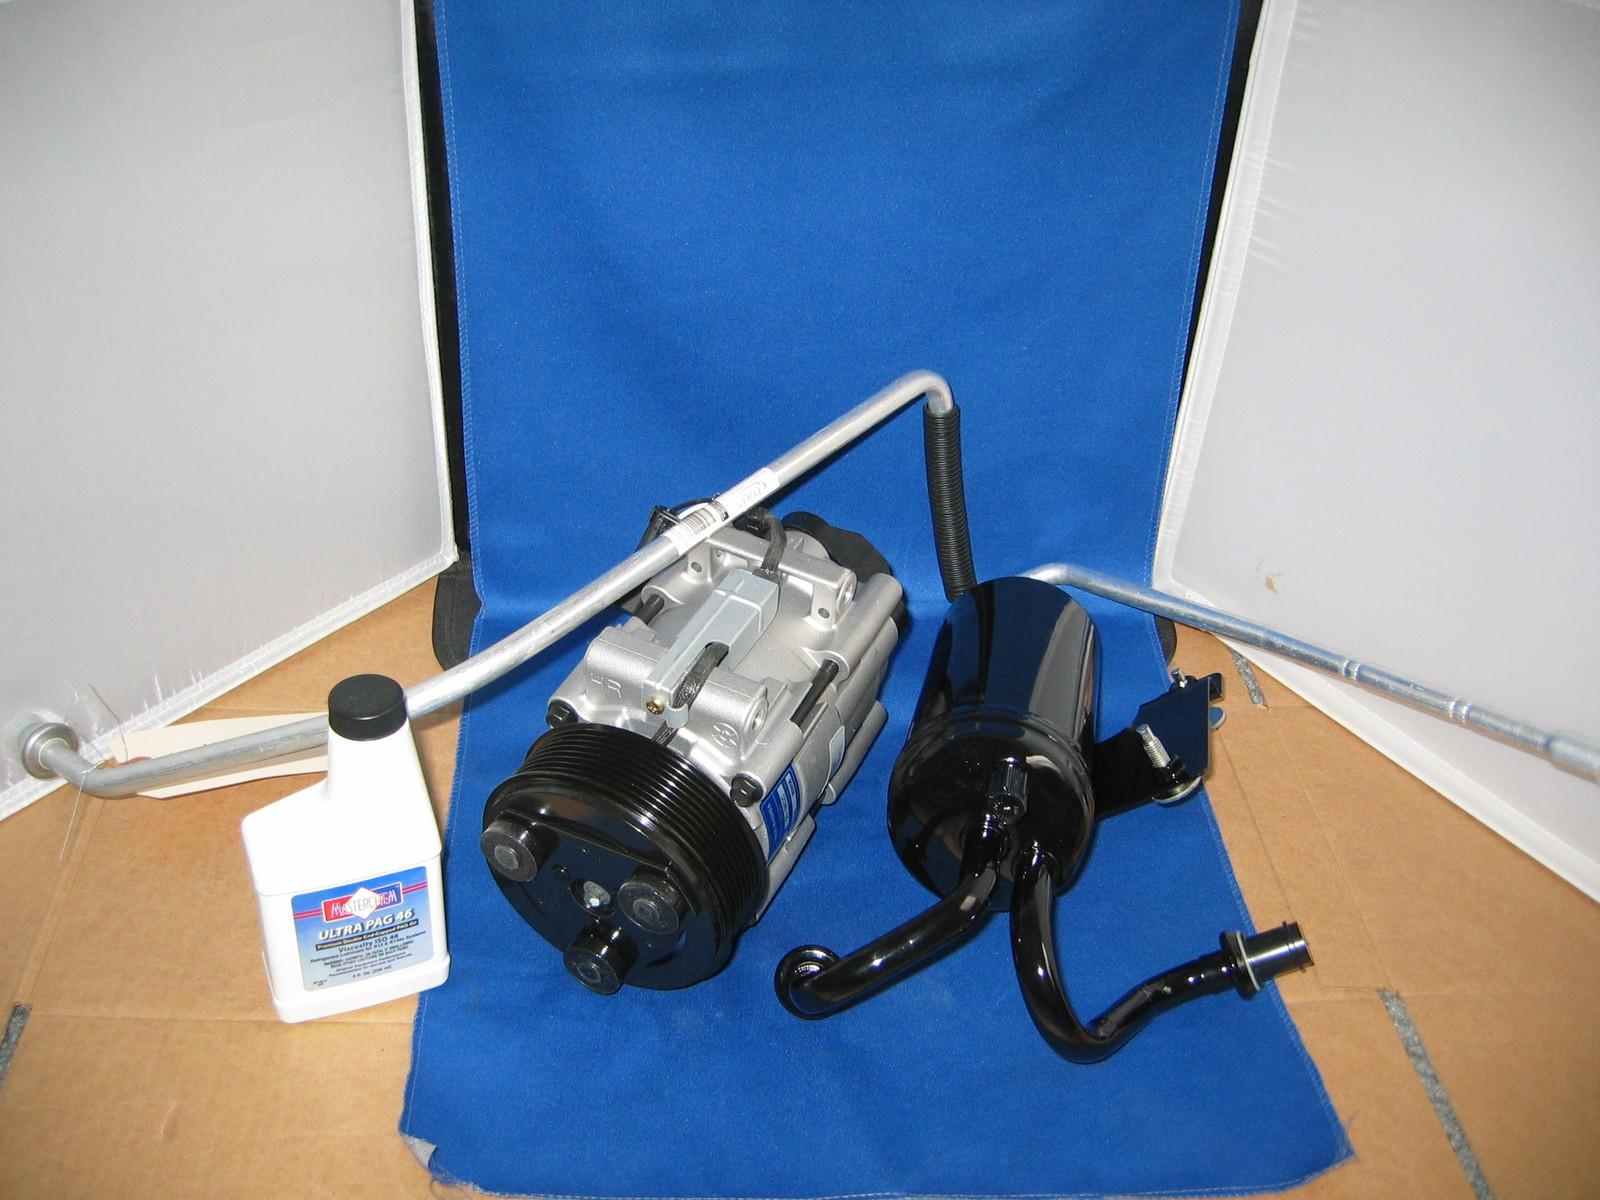 06 09 dodge ram 2500 3500 5.9 6.7 diesel auto air ac conditioning compressor kit  2